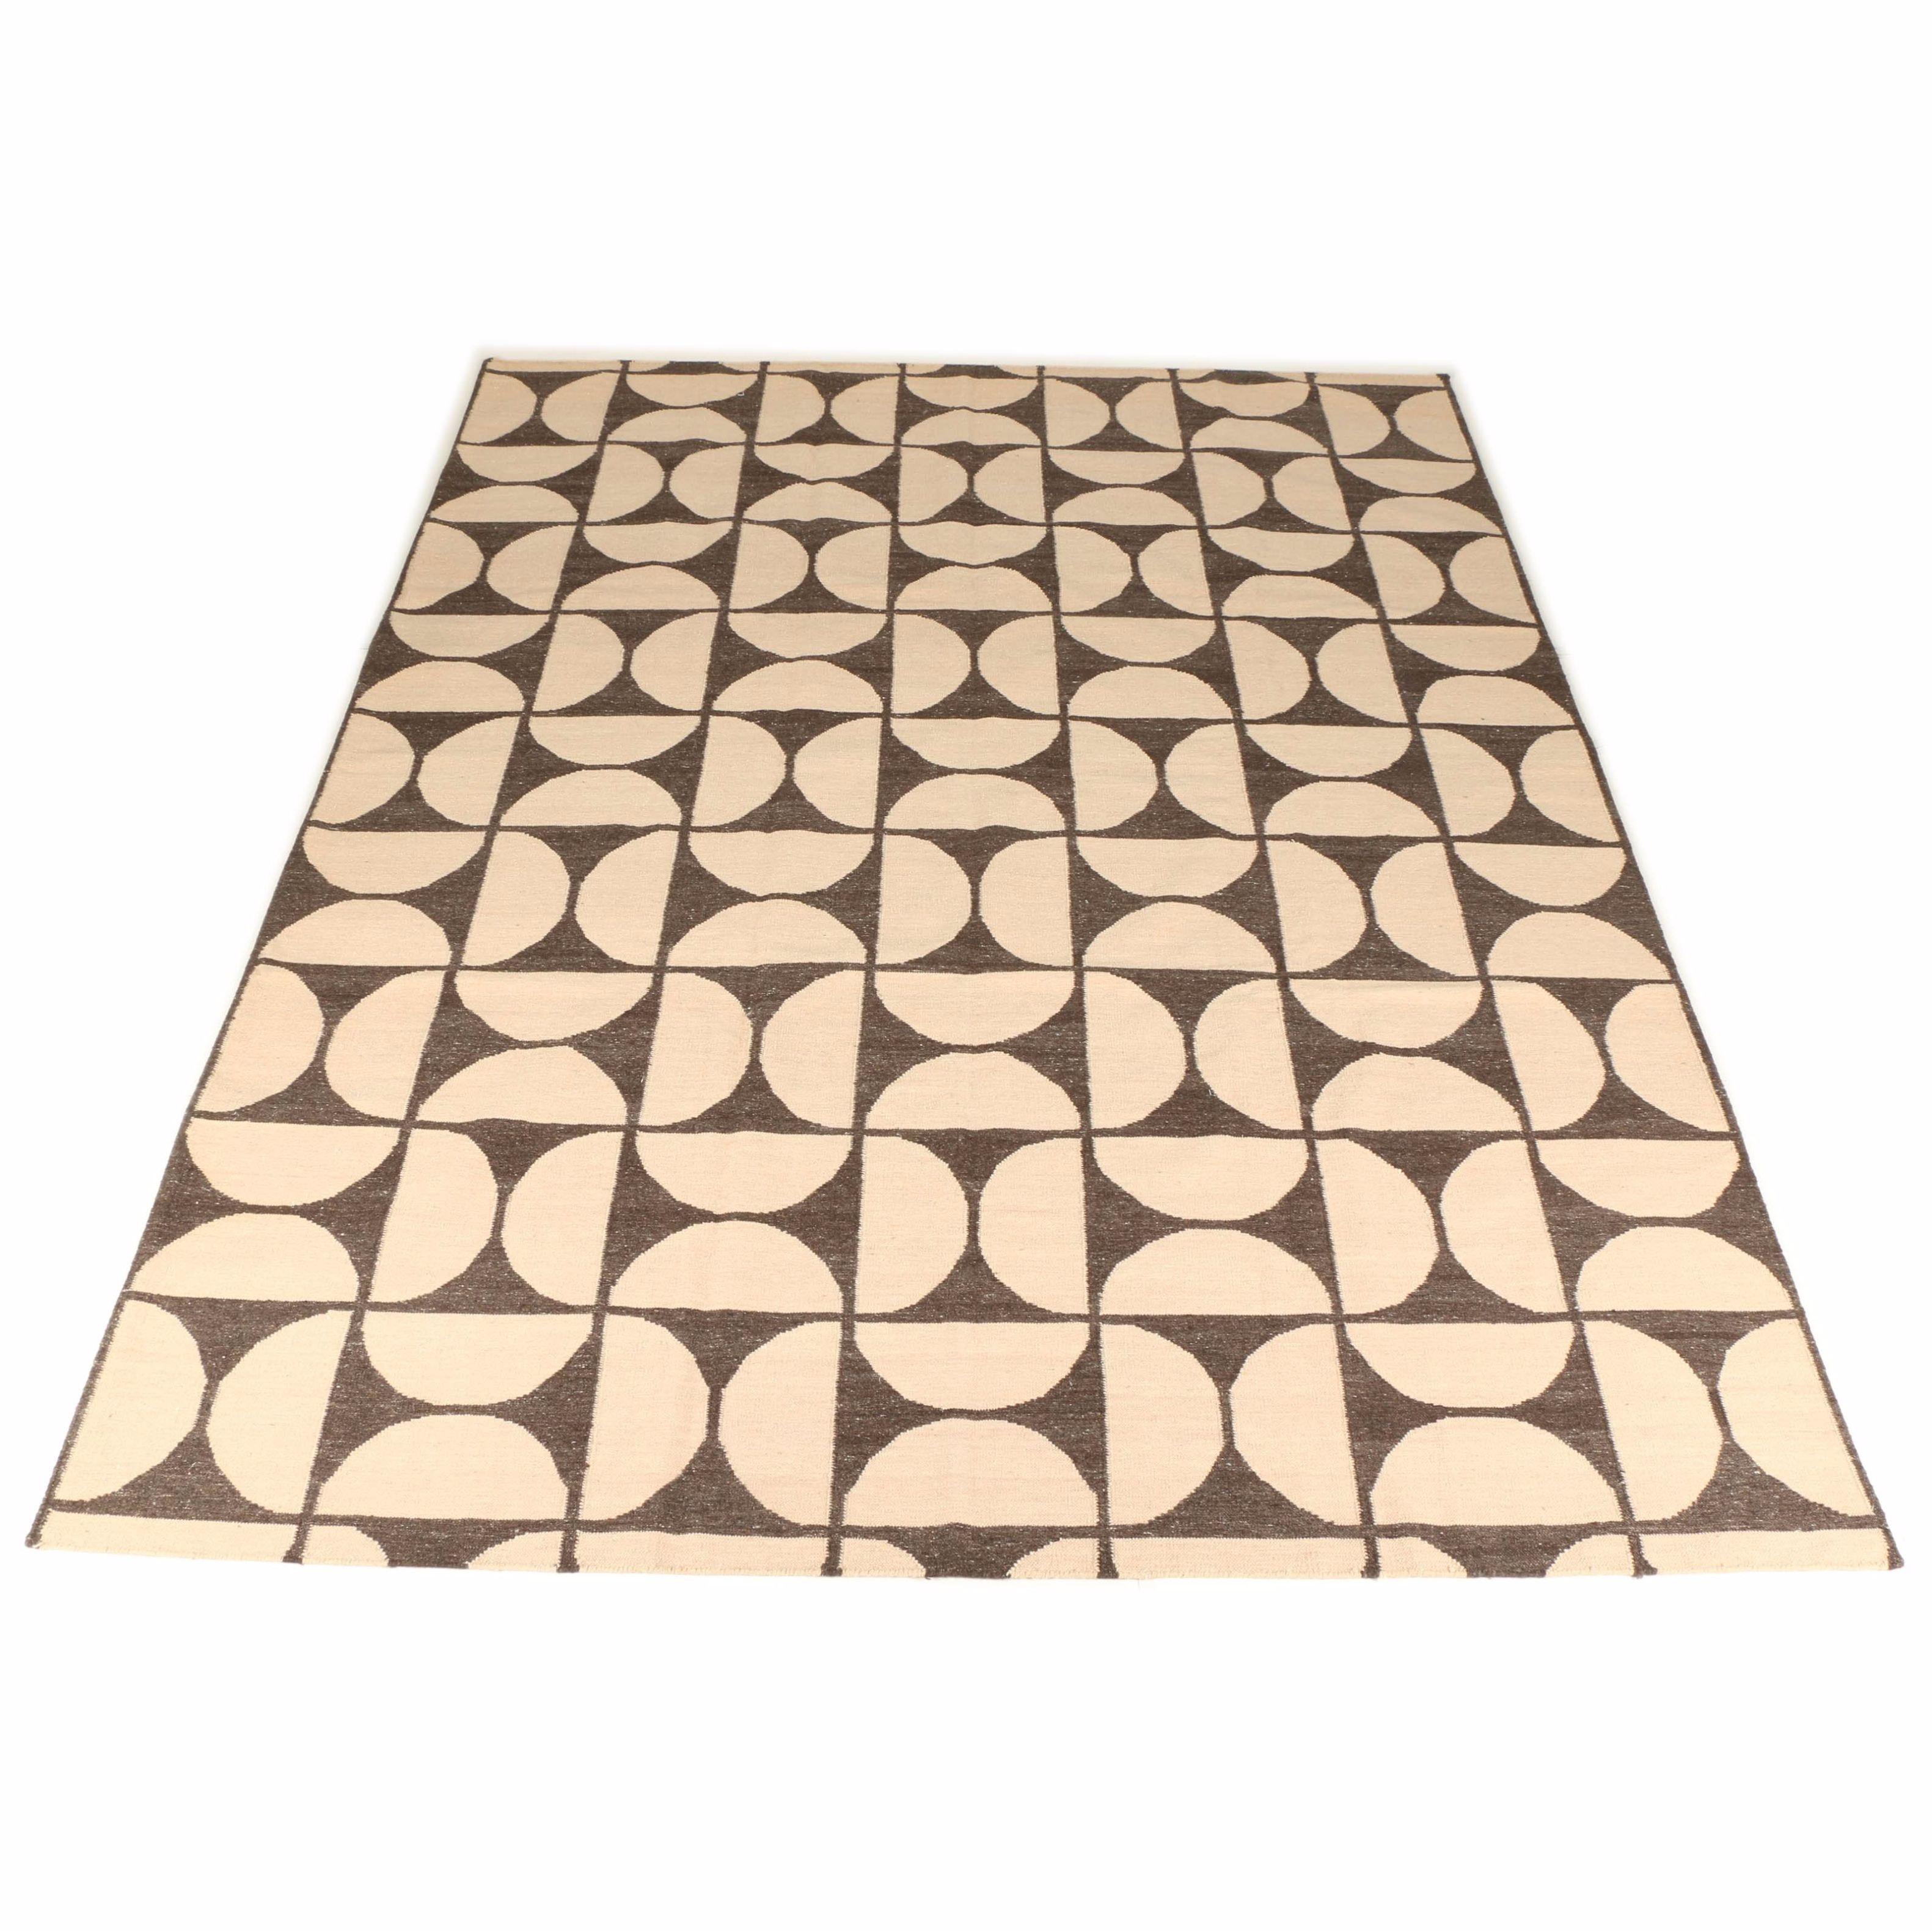 Handwoven Geometric Shaped Wool Indian Kilim Area Rug